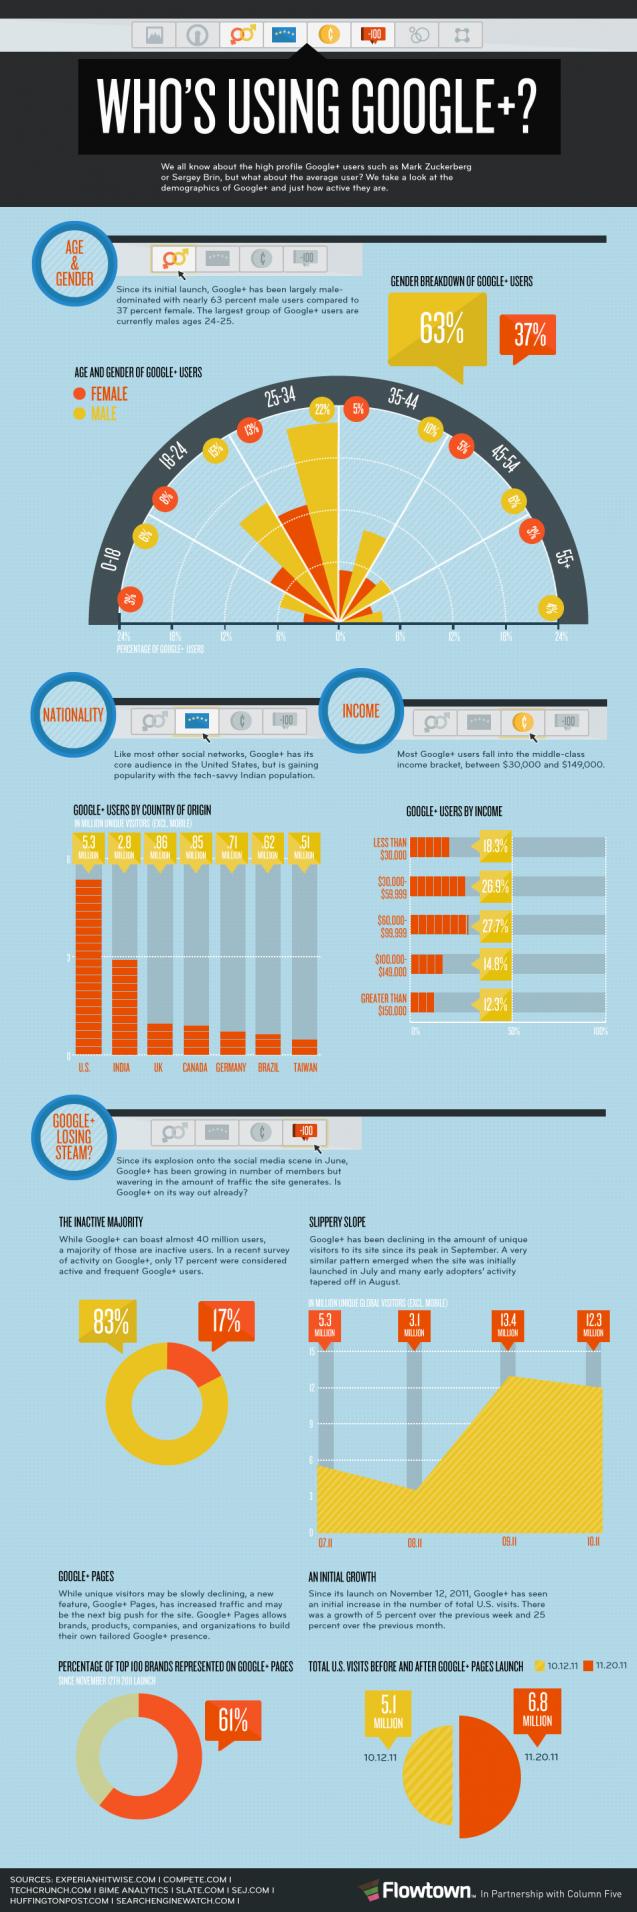 Breakdown of Who Uses Google+